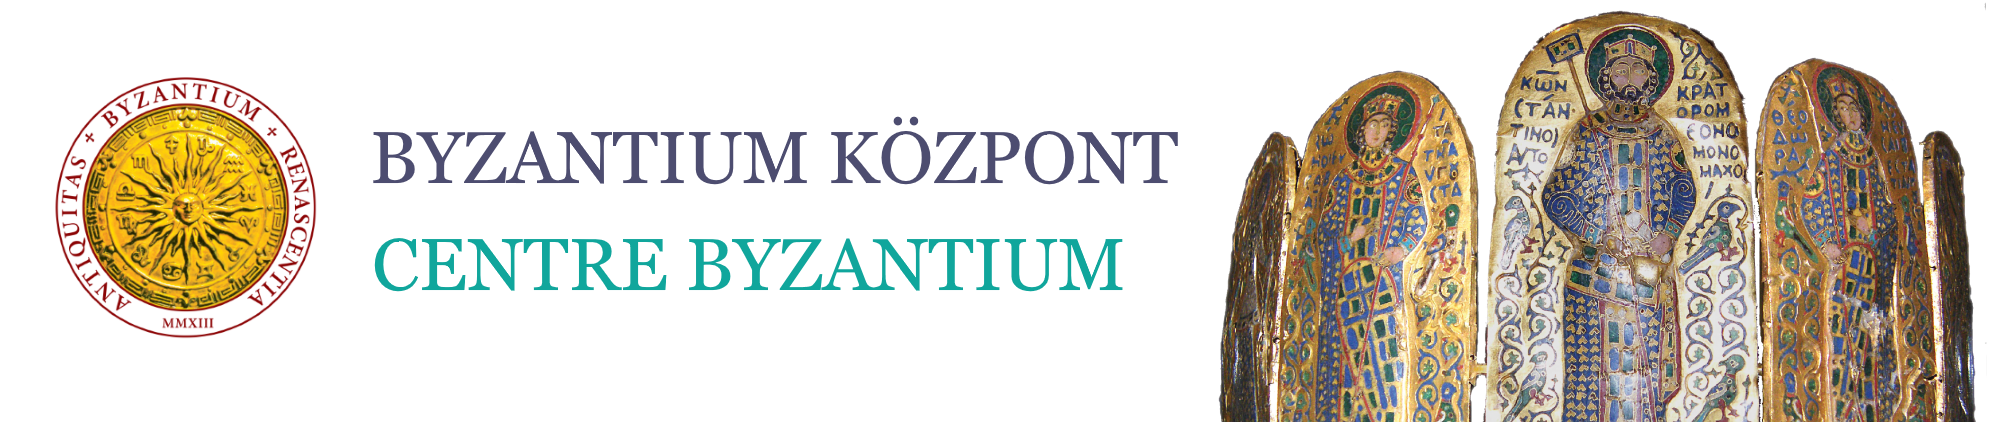 BYZANTIUM KÖZPONT | CENTRE BYZANTIUM